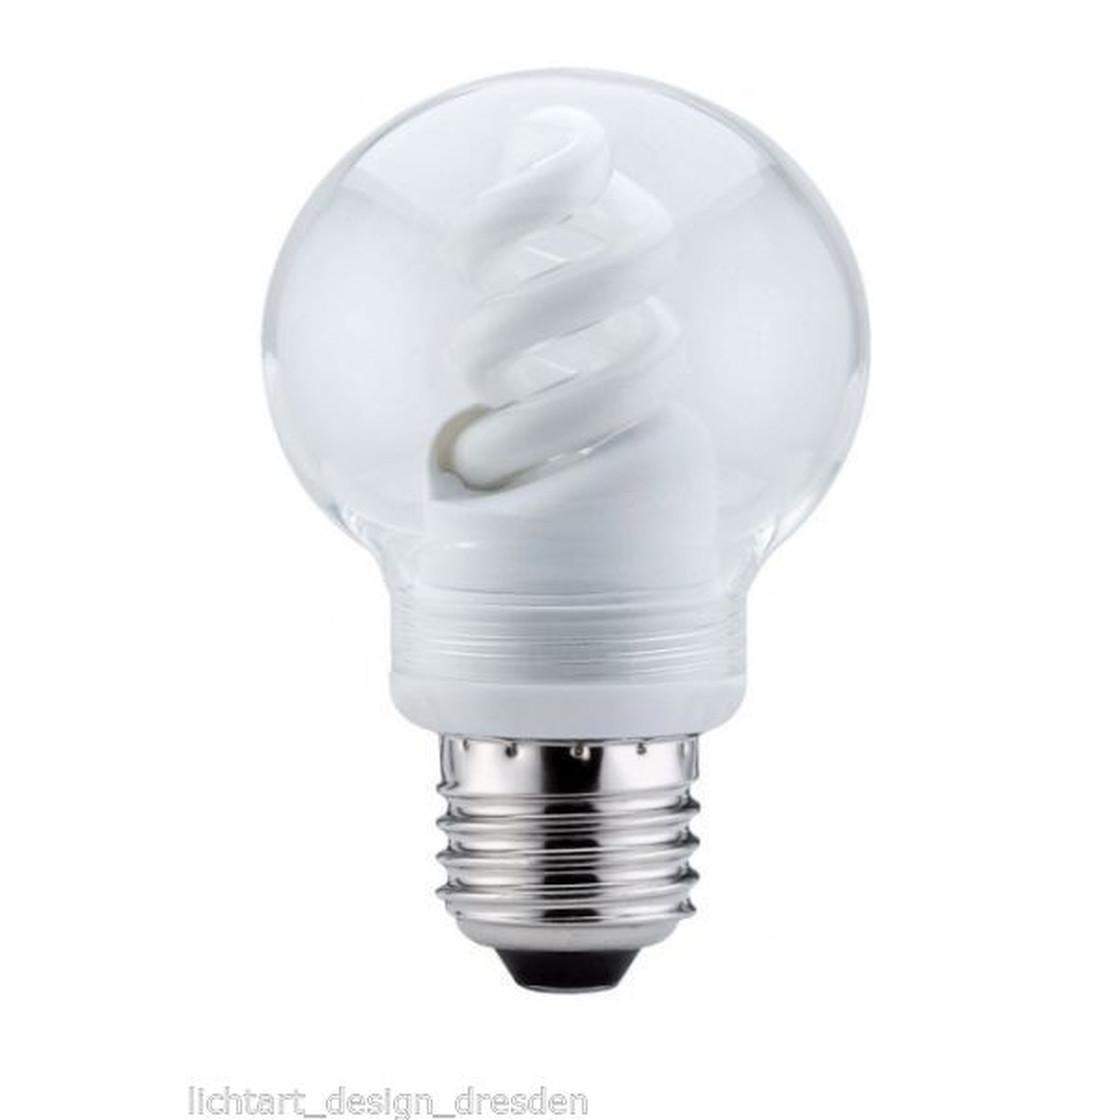 paulmann globe 60 energiesparlampe 7 w klar e27 g nstiger 8701 1 99. Black Bedroom Furniture Sets. Home Design Ideas